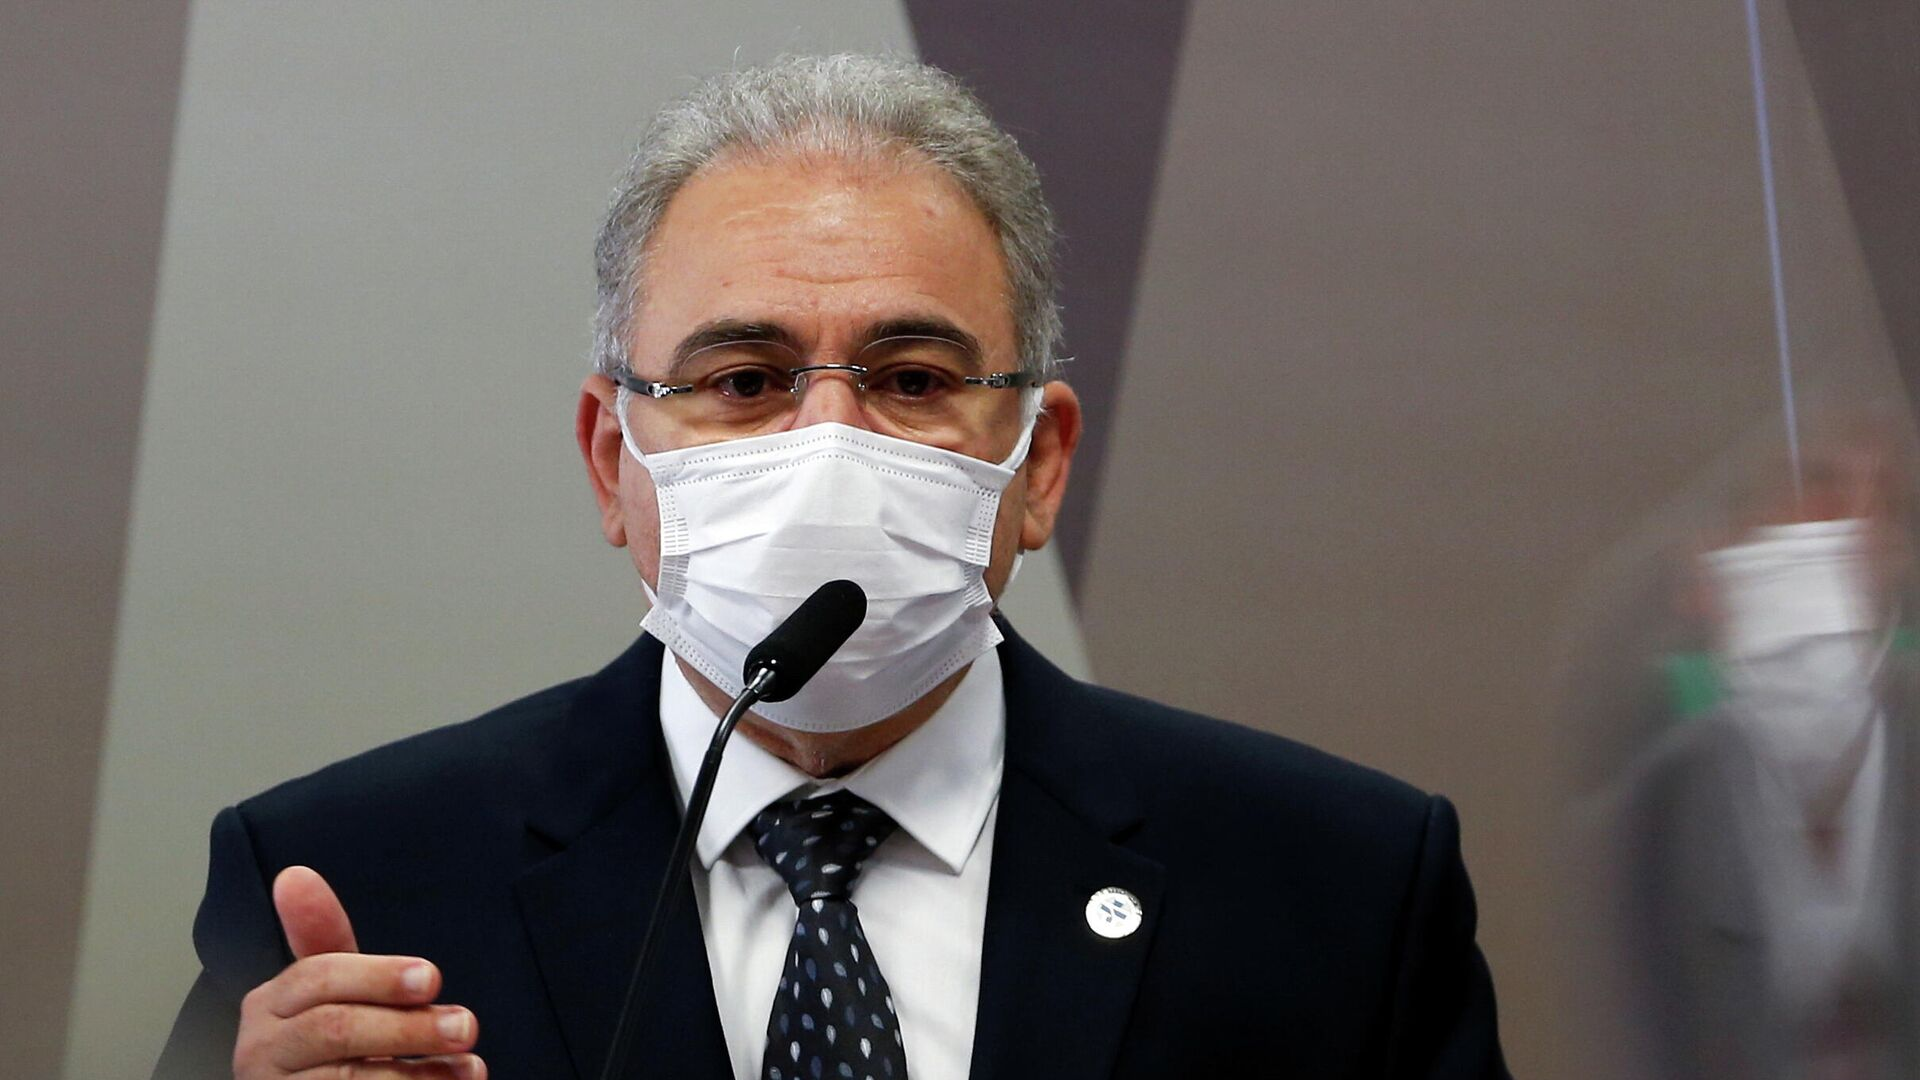 El ministro de Salud de Brasil, Marcelo Queiroga - Sputnik Mundo, 1920, 08.06.2021